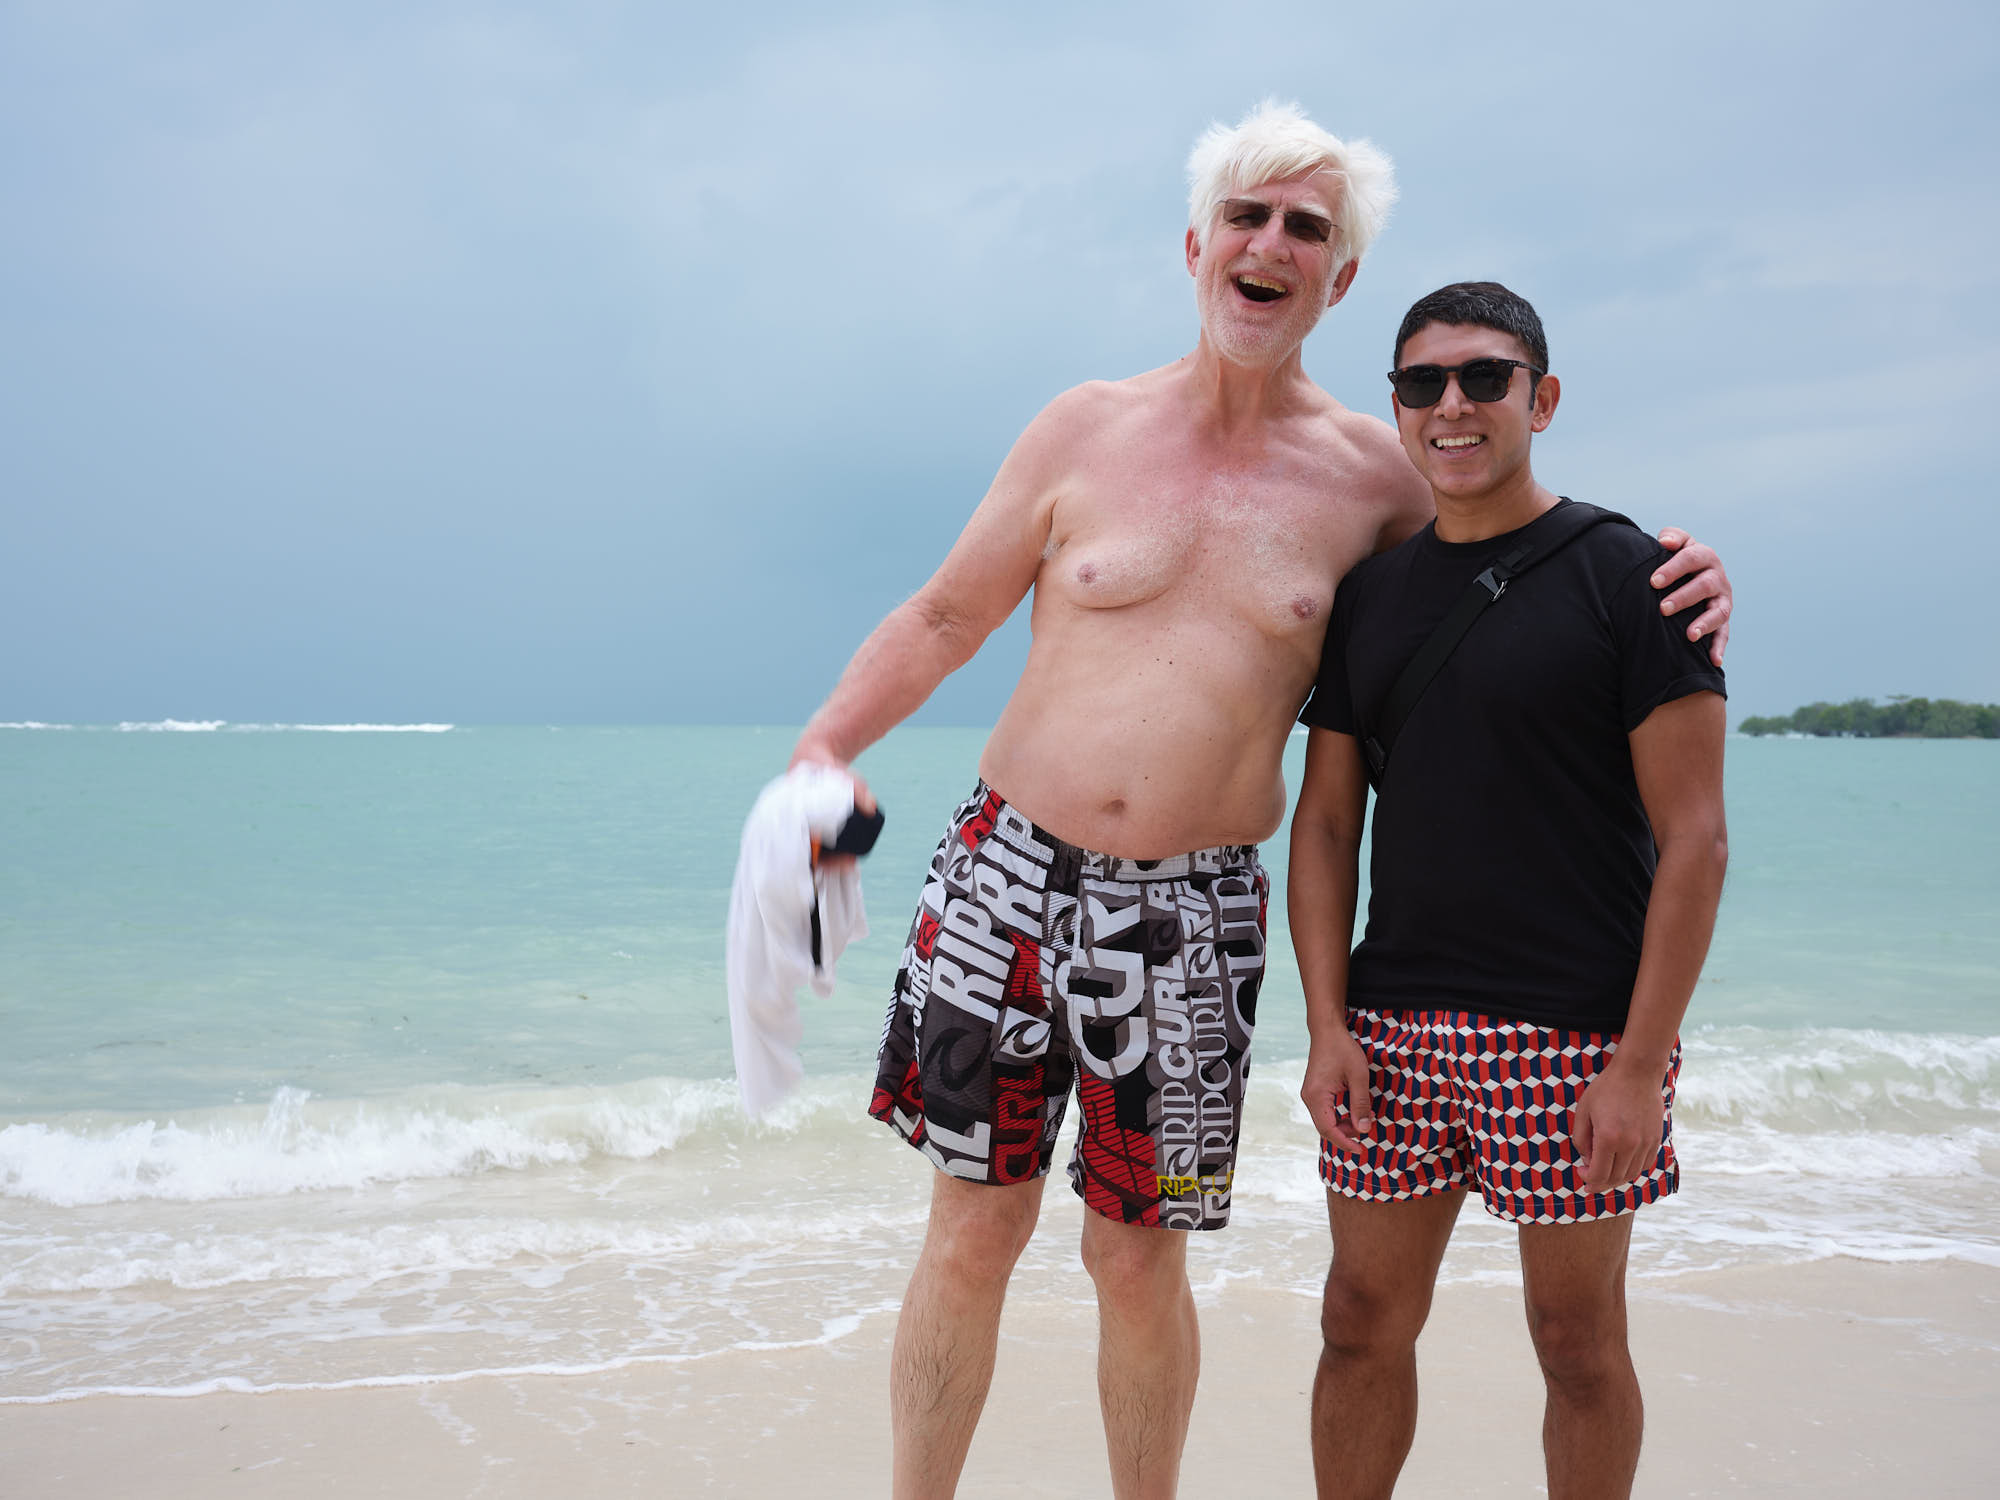 Photobombed at the beach in Koh Samui